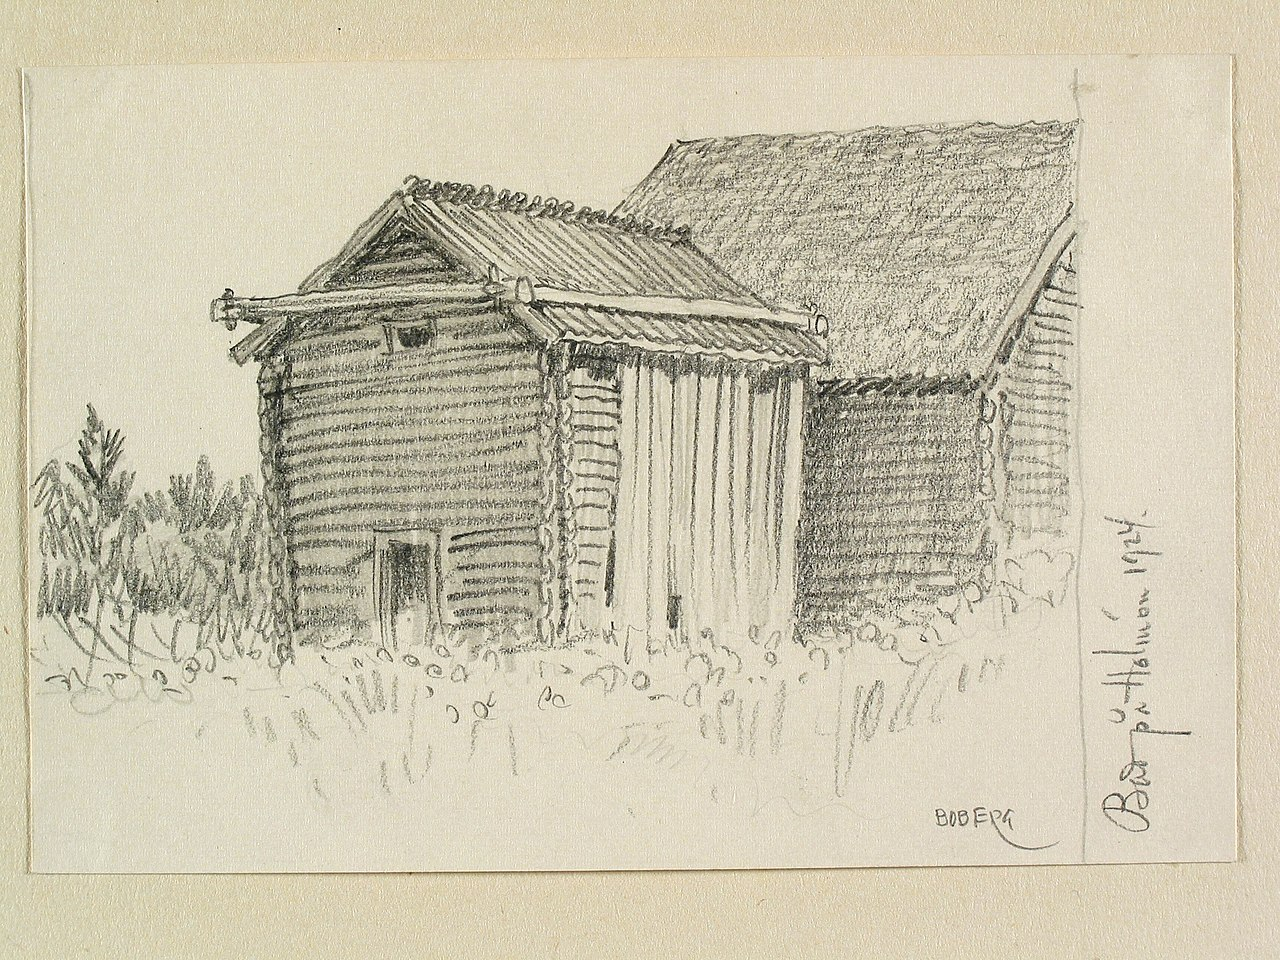 File:Vsterbotten, Svars sn., Holmns kapellfrsamling. Bod